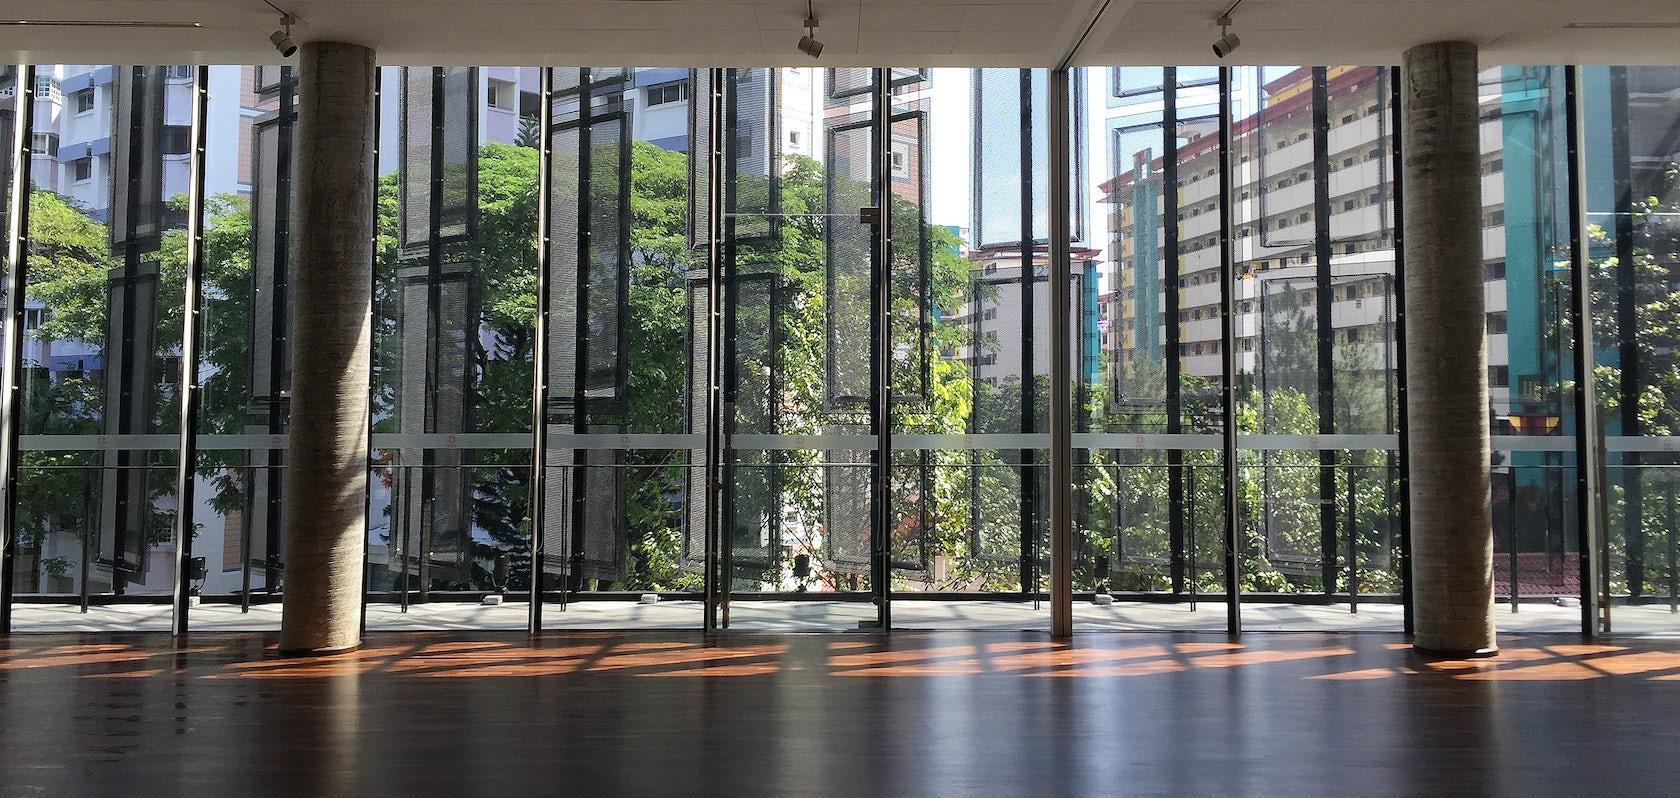 Bridge Street Auto >> Taman Jurong Community Club Extension - Architizer